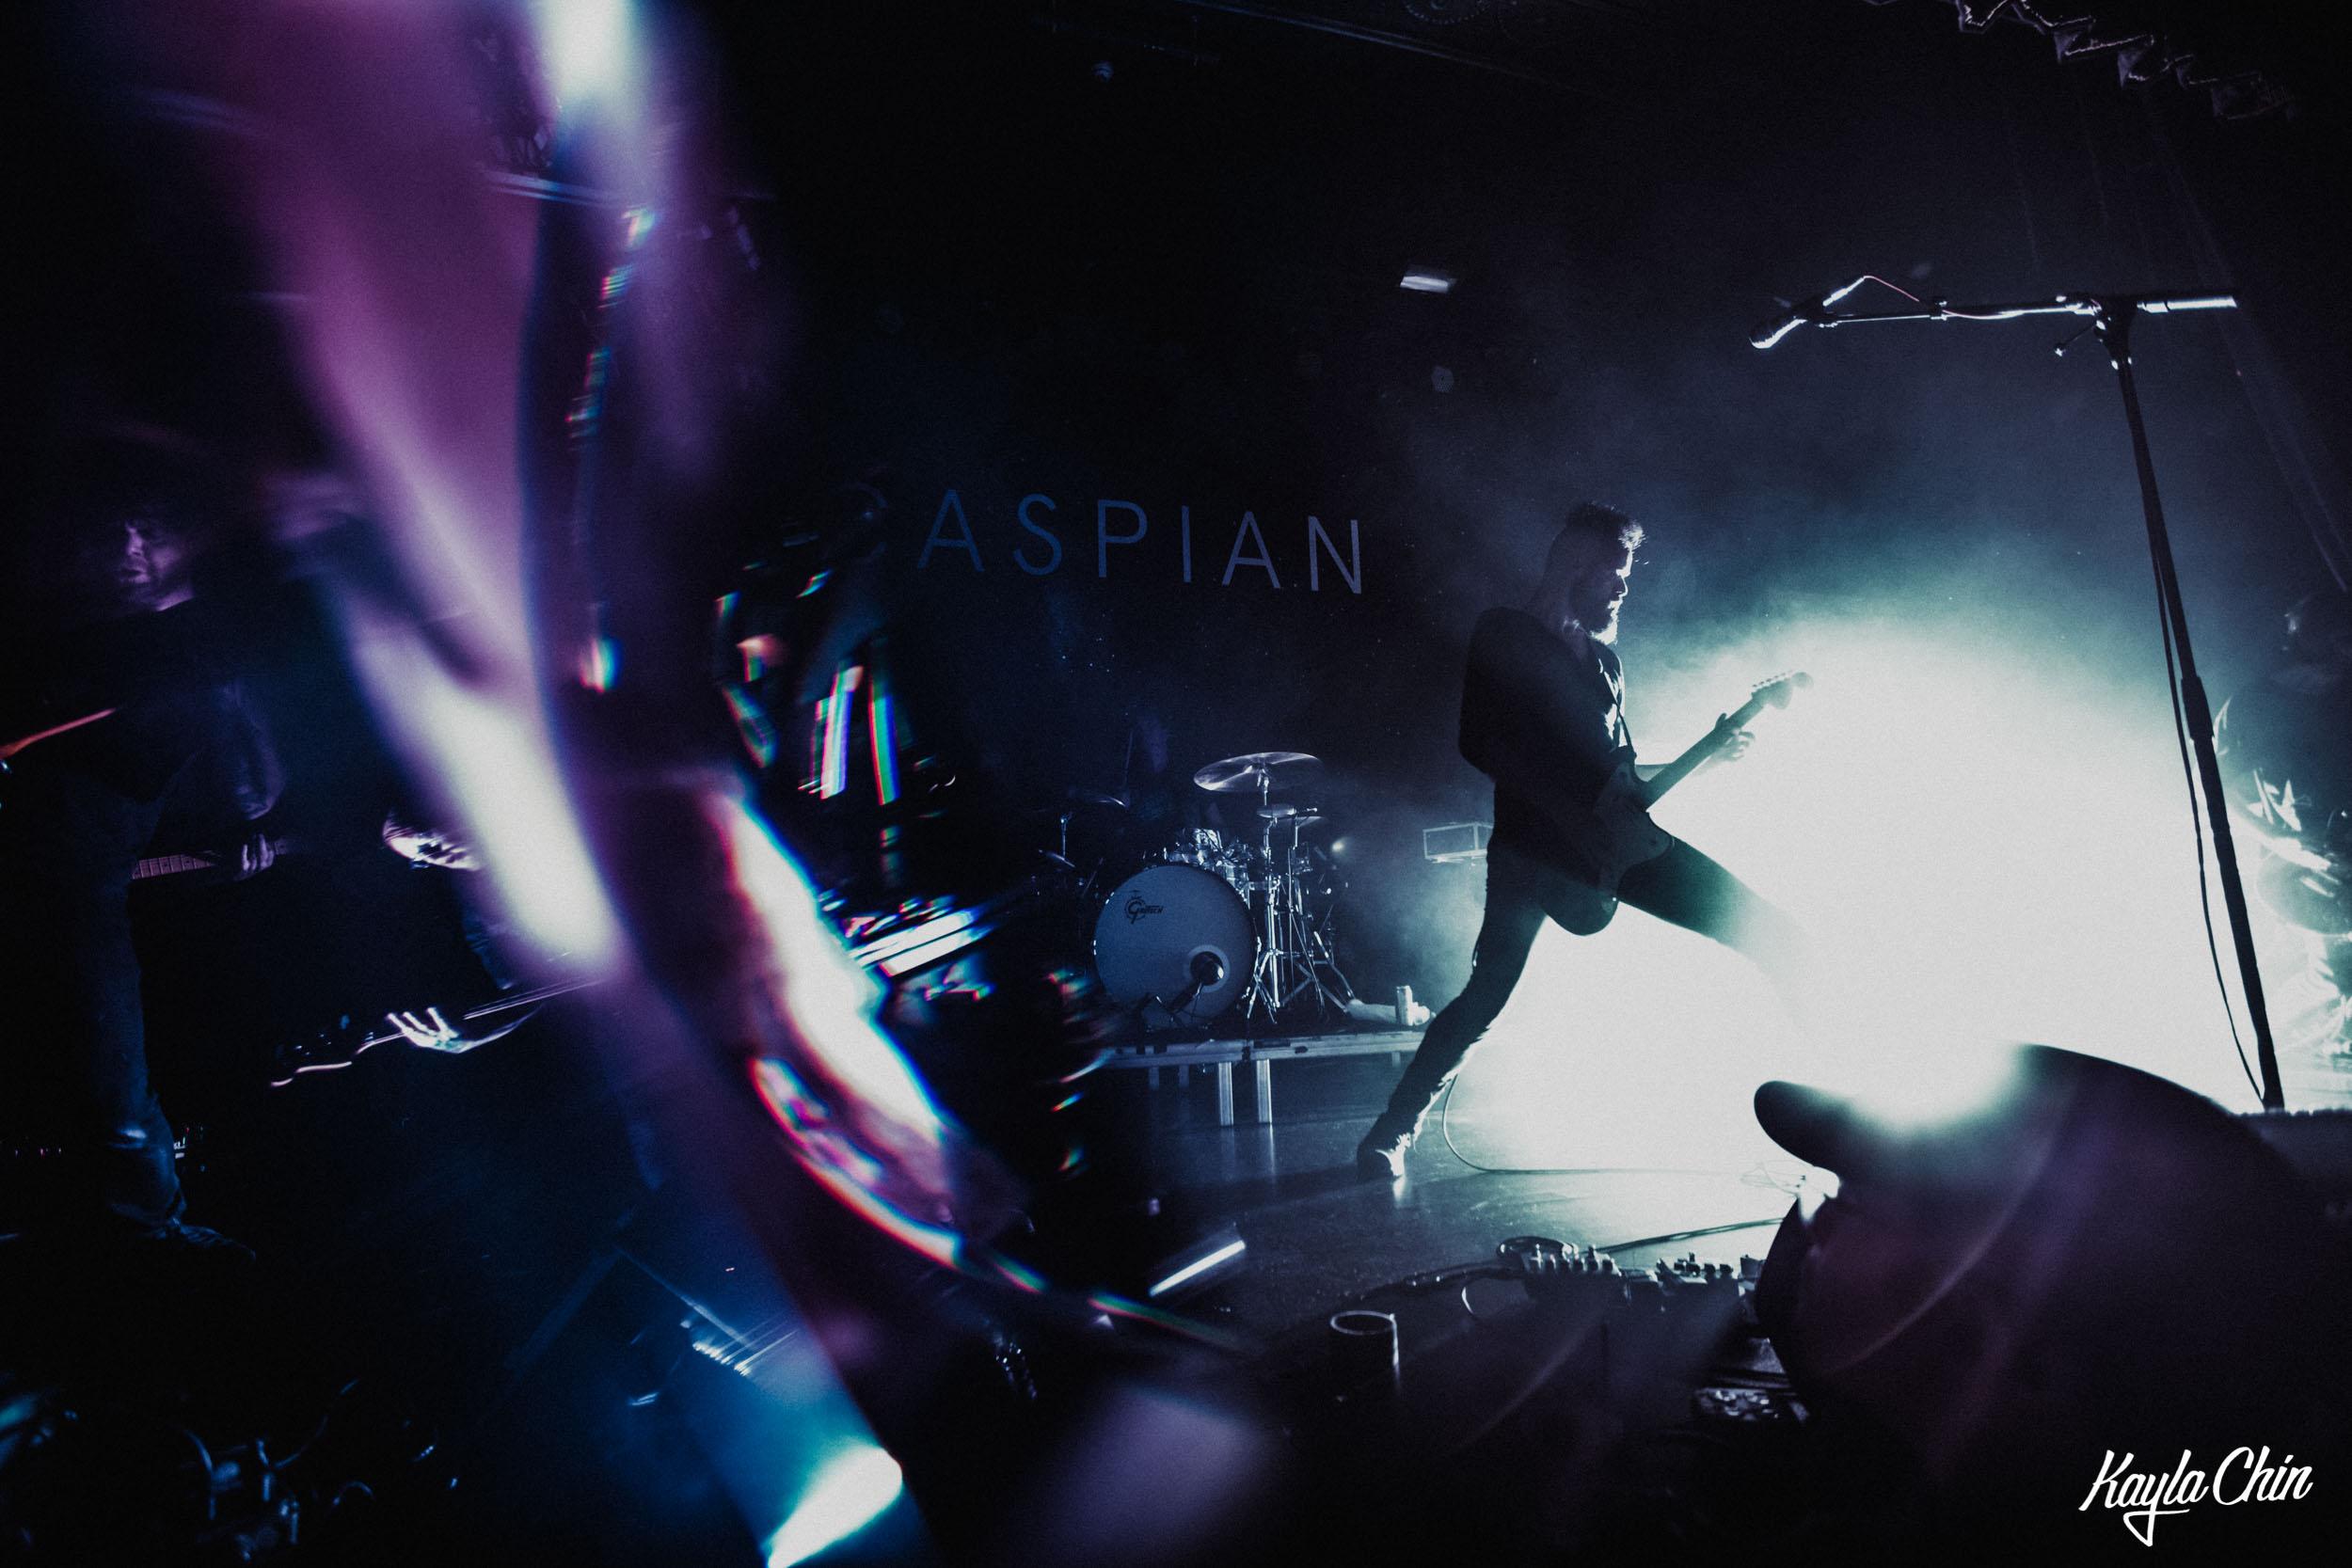 Caspian-2-2.jpg